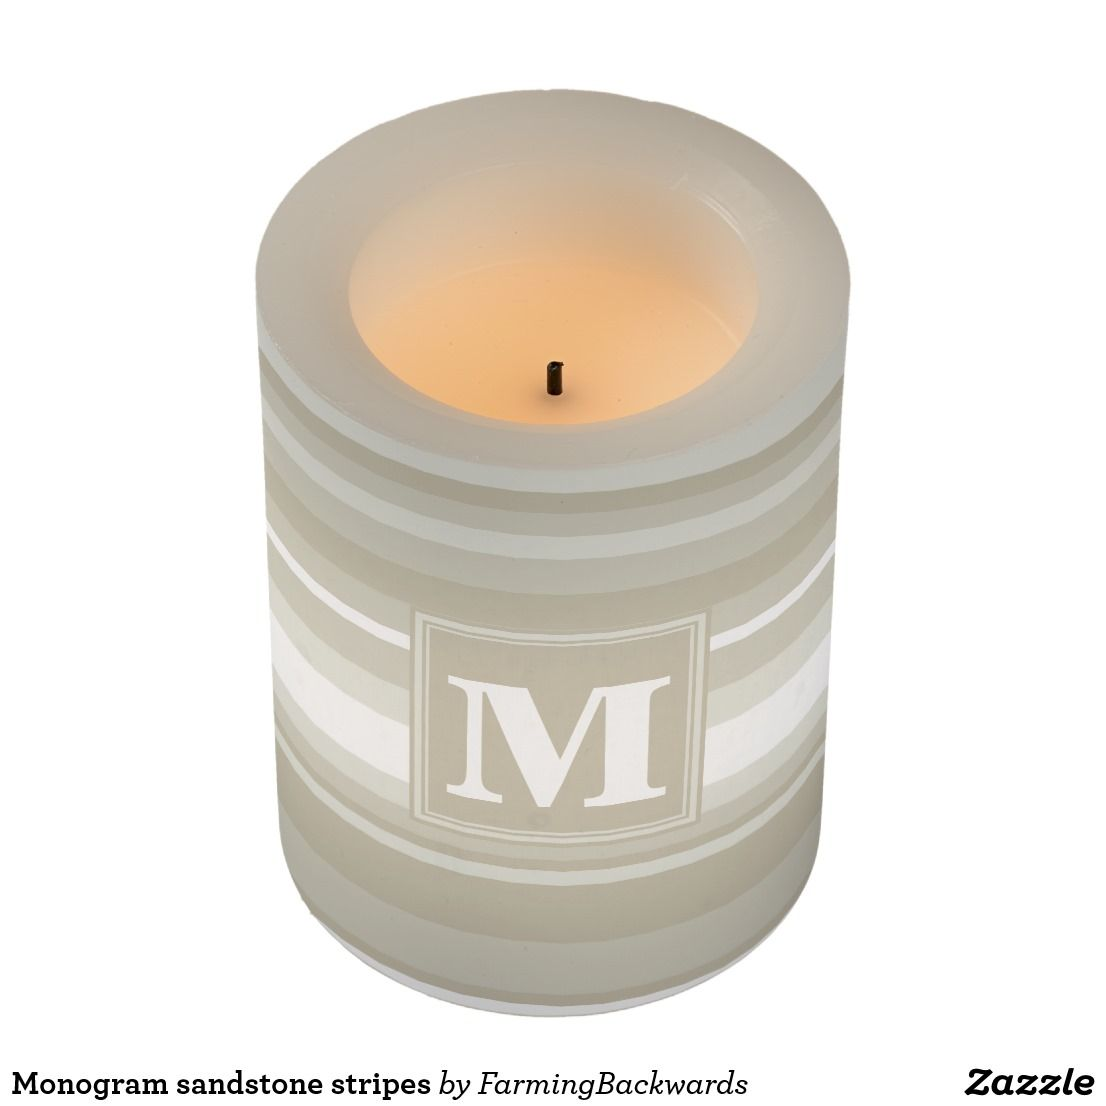 Monogram sandstone stripes flameless candle